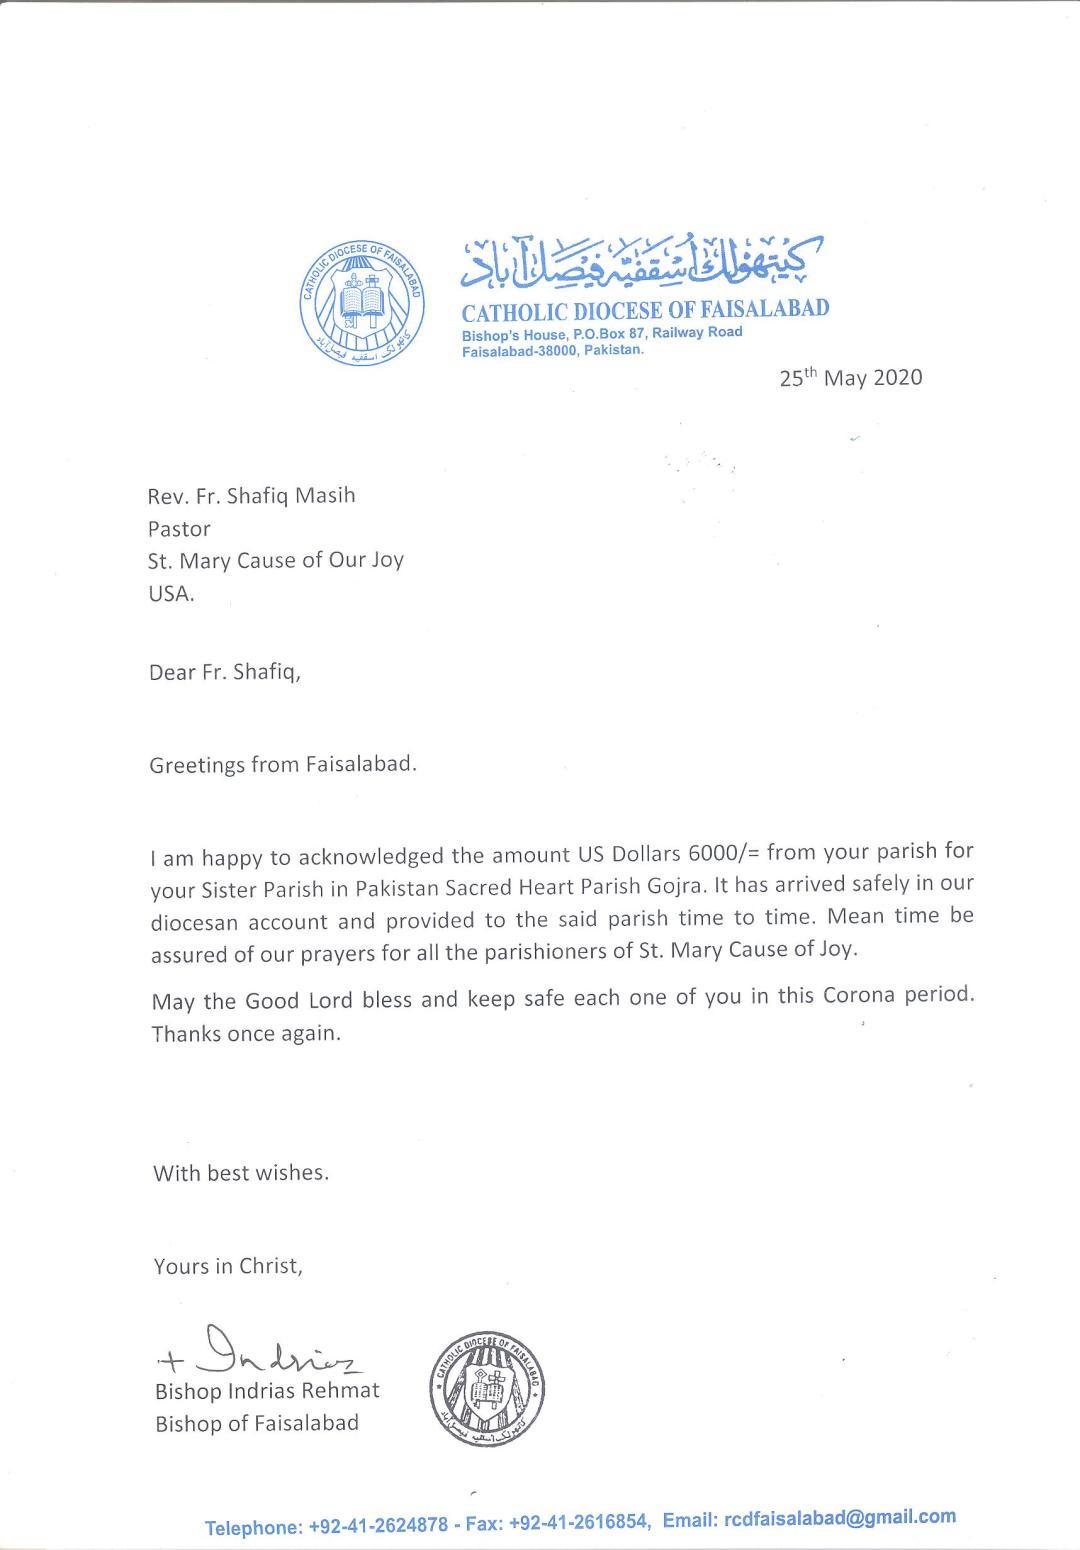 Acknowledgement letter 001 (3)